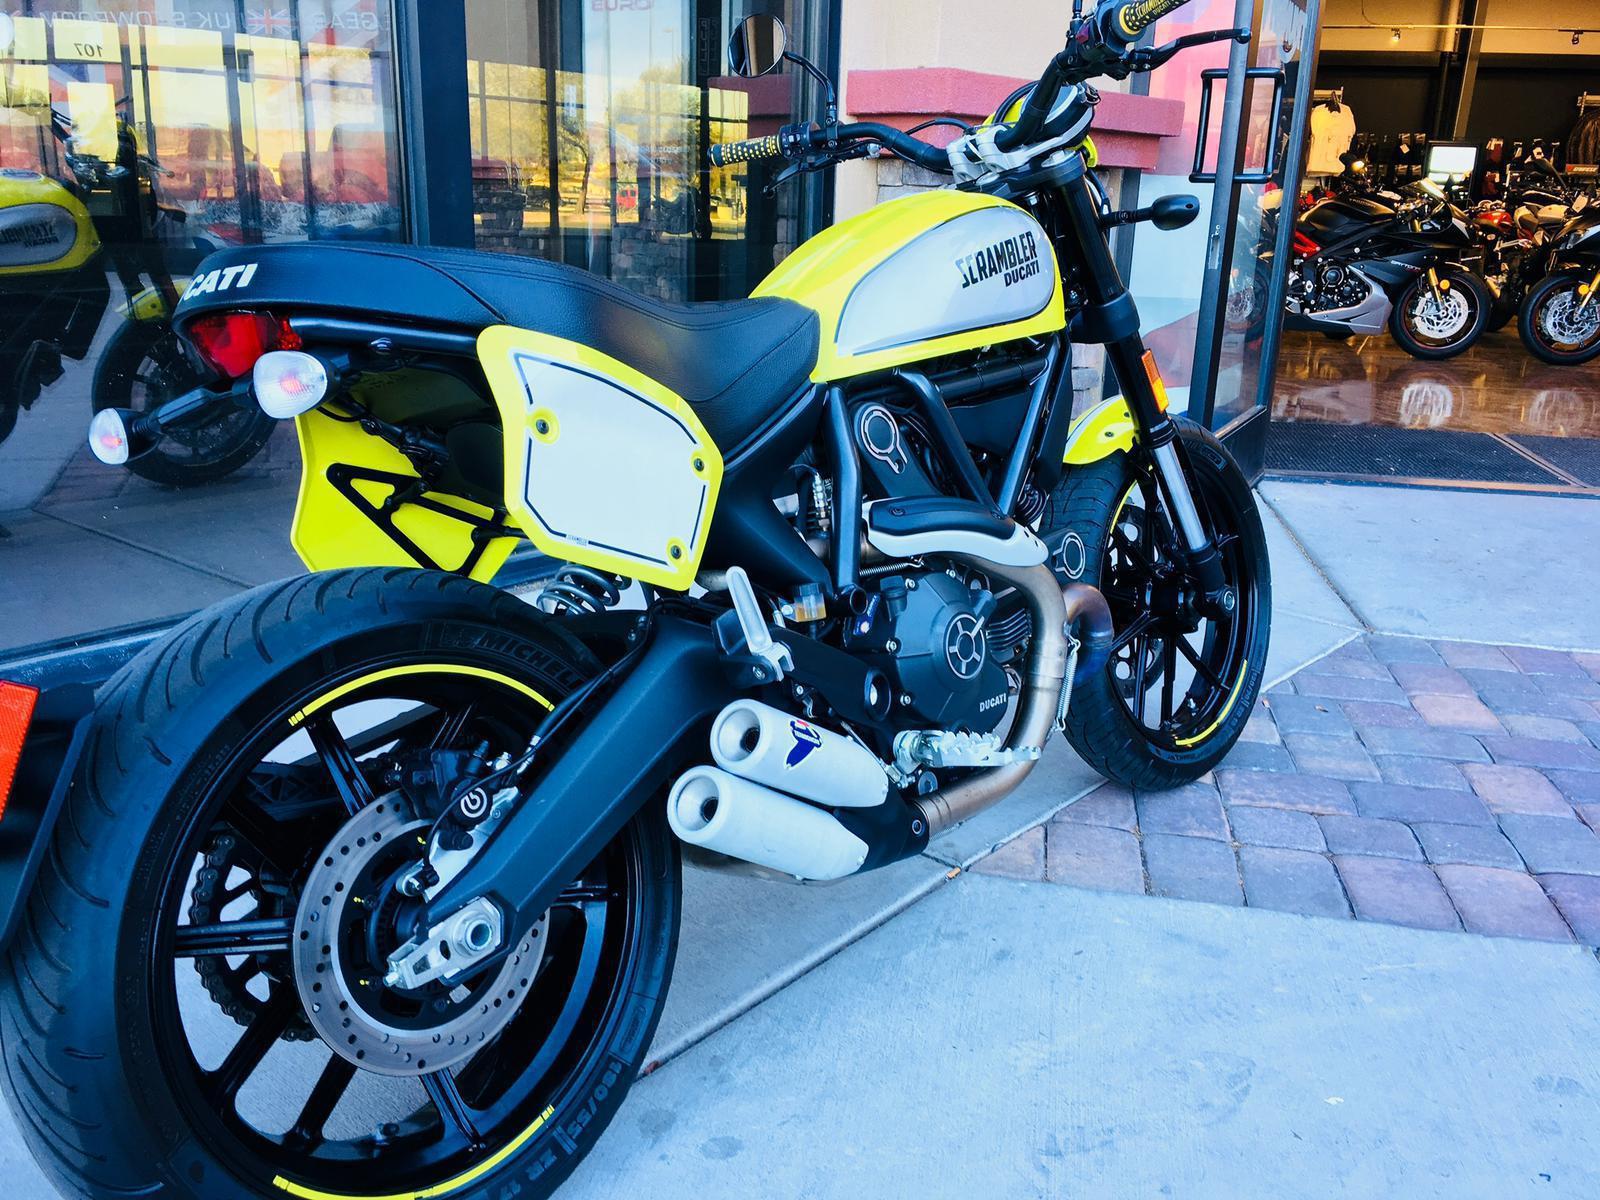 2016 Ducati Scrambler Flat Track Pro For Sale In Las Vegas Nv